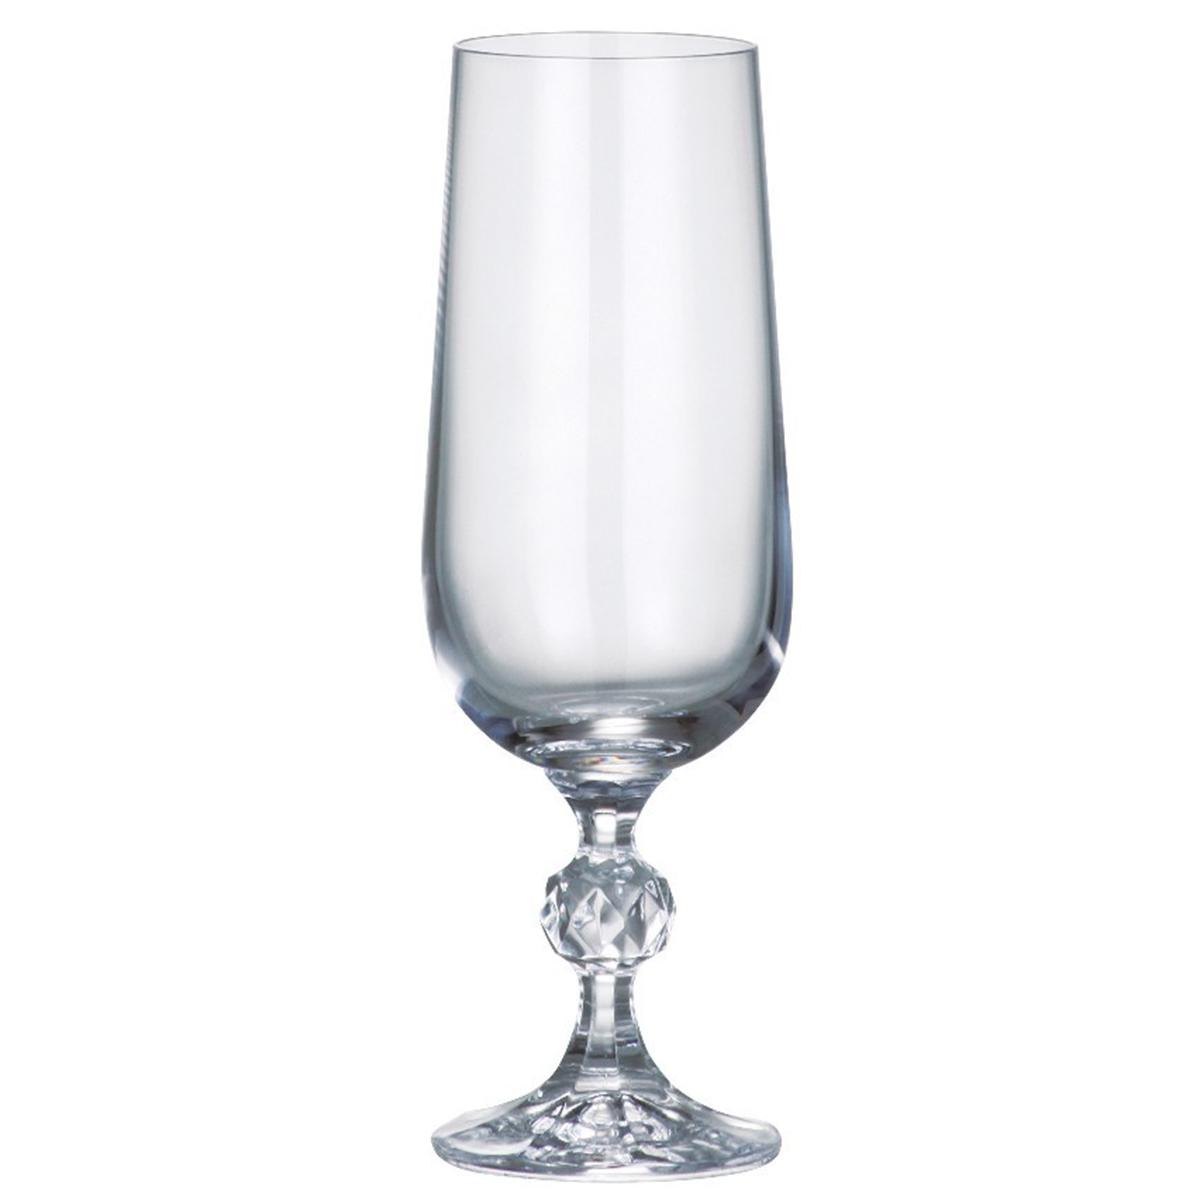 Набор бокалов для шампанского Bohemia Crystal Клаудия, 180 мл, 6 шт. 40149/180 набор бокалов для шампанского bohemia crystal оливия 190 мл 6 шт